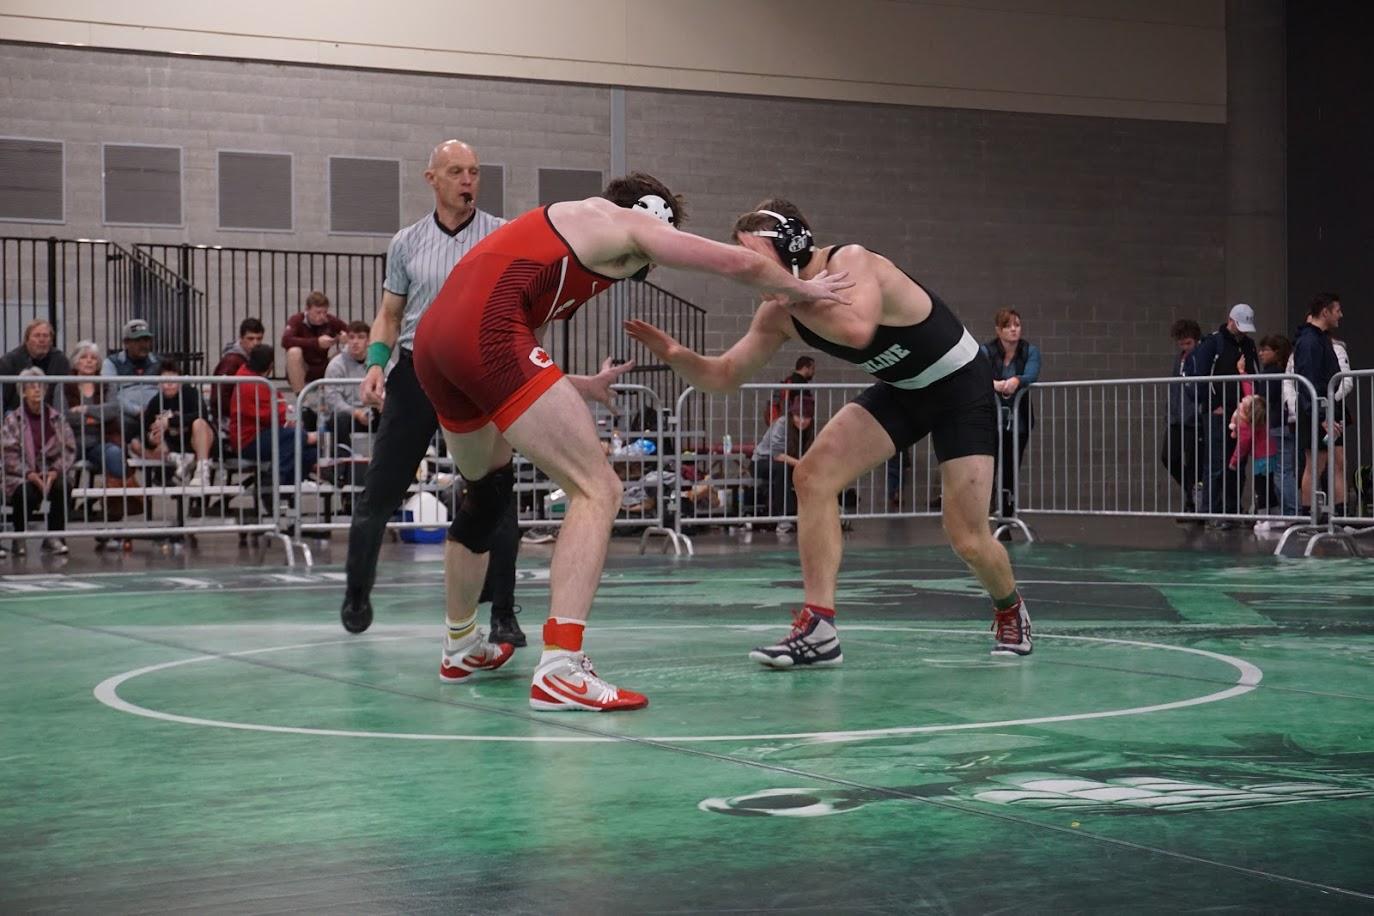 Gallery Highline Wrestling 2019/20 (Wrestling home page gallery)